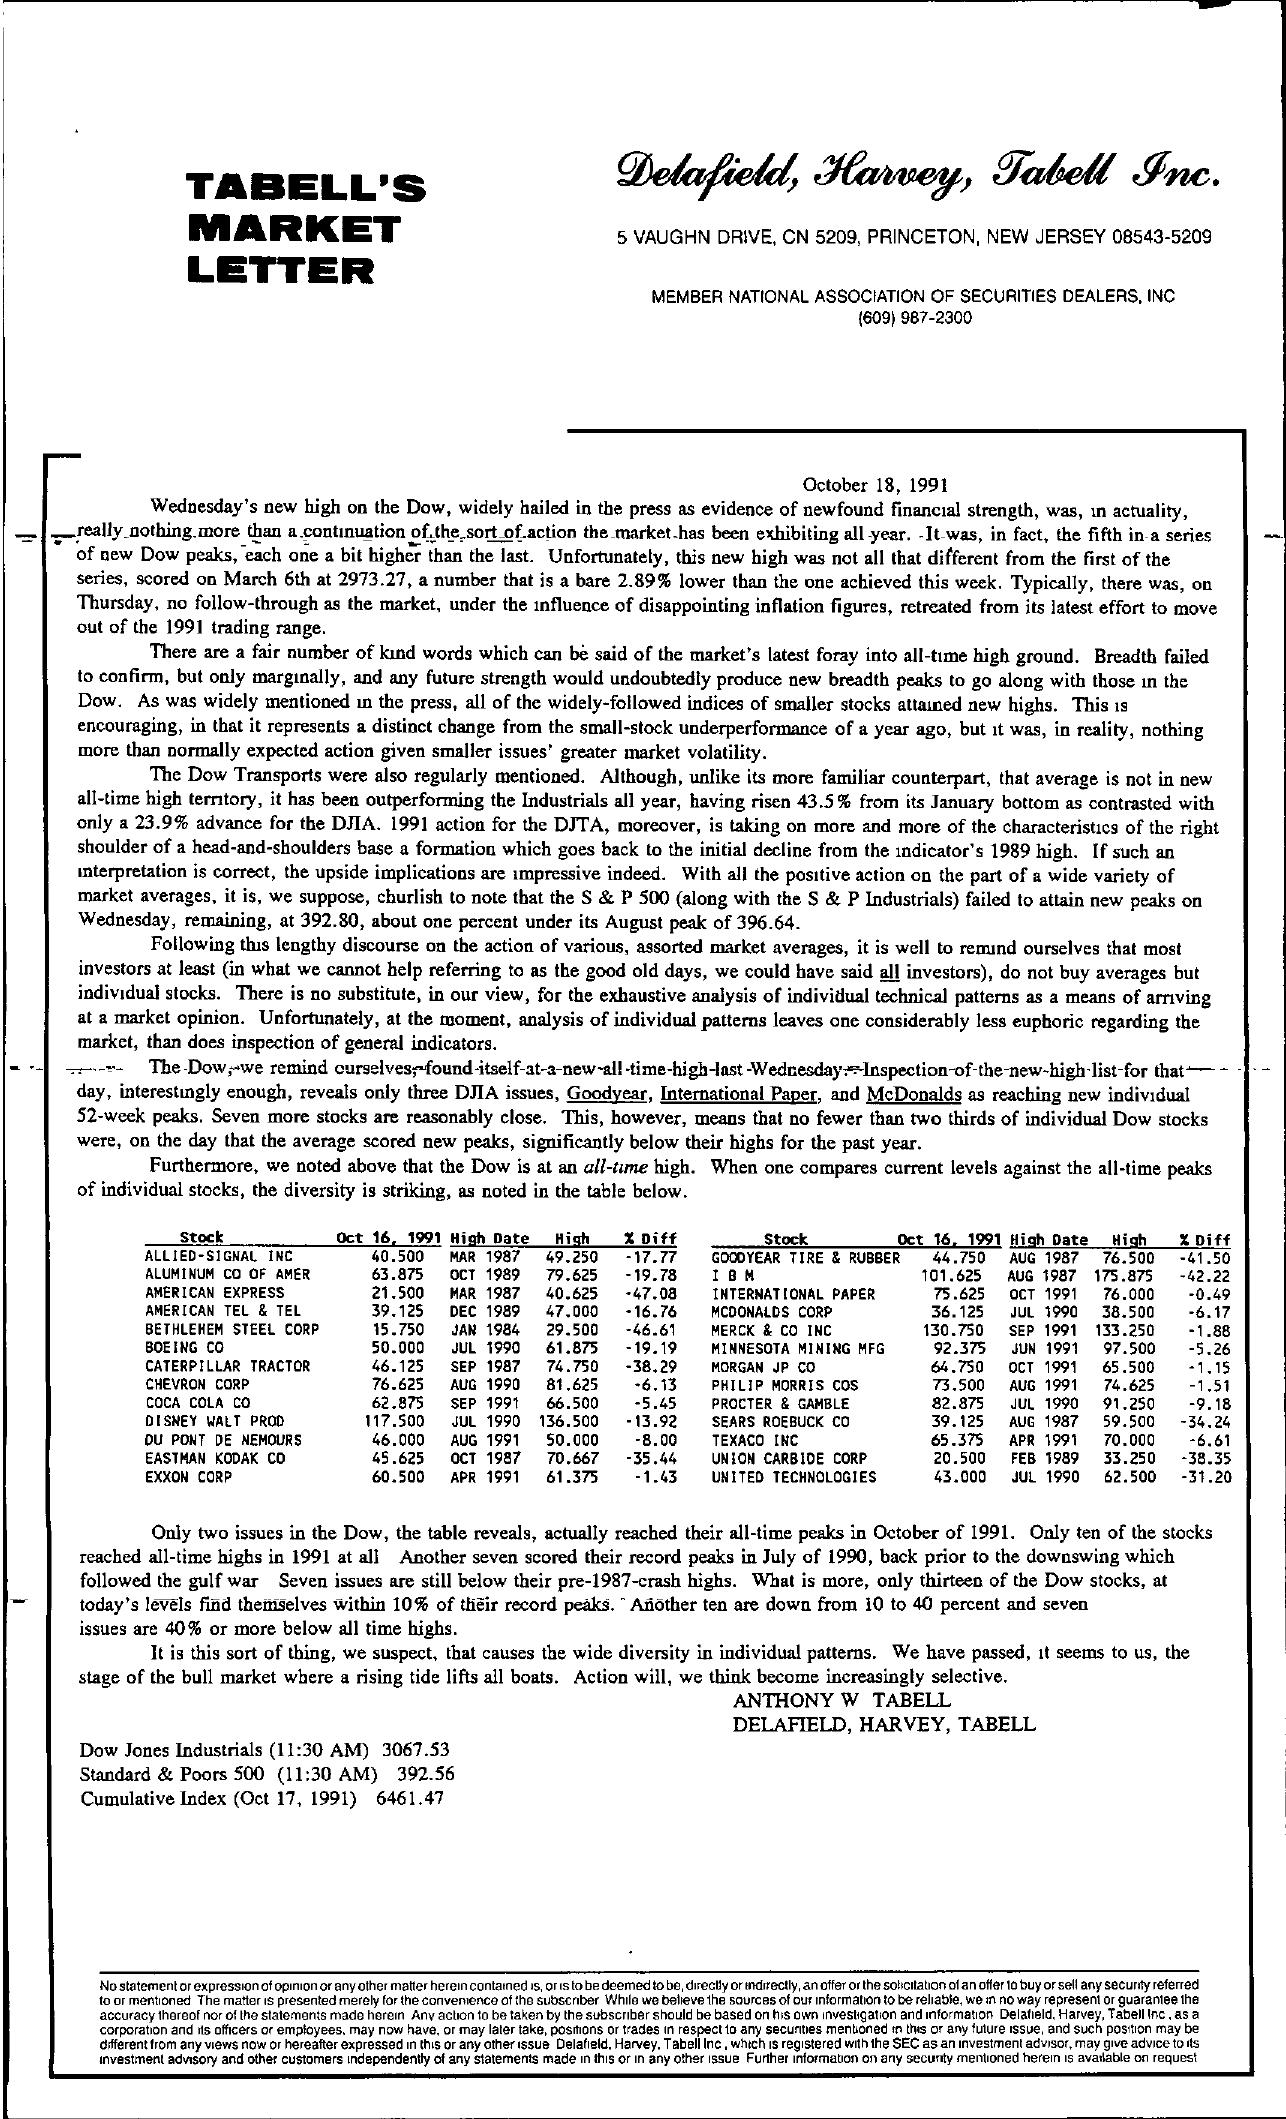 Tabell's Market Letter - October 18, 1991